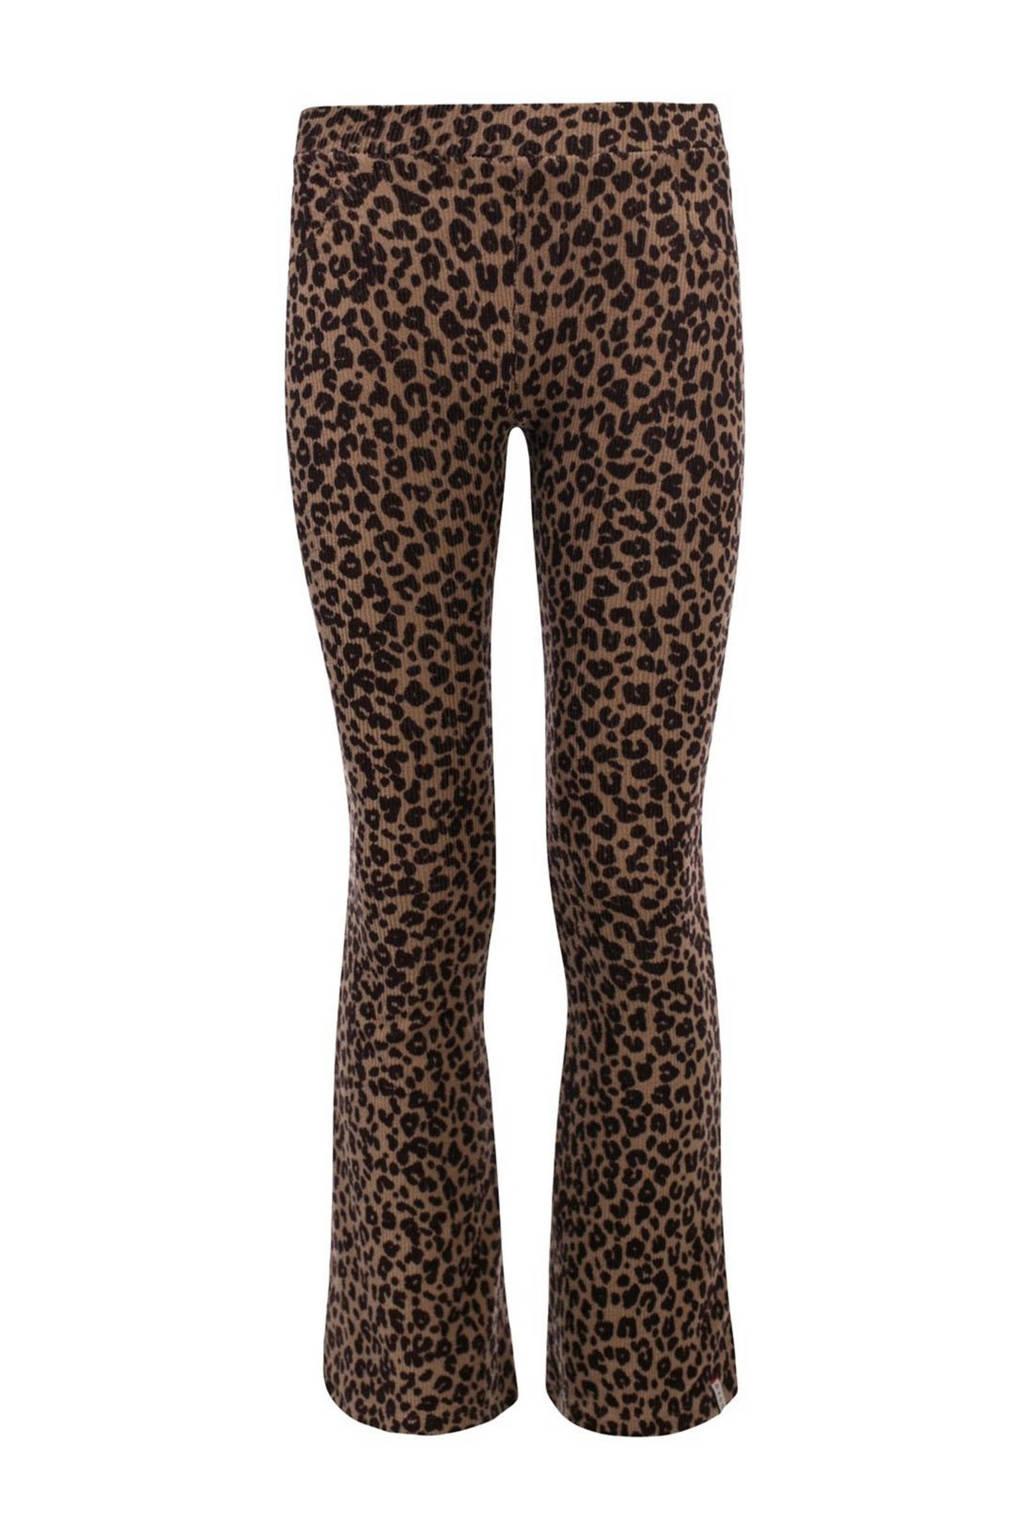 LOOXS little flared broek met panterprint bruin/zwart, Bruin/zwart